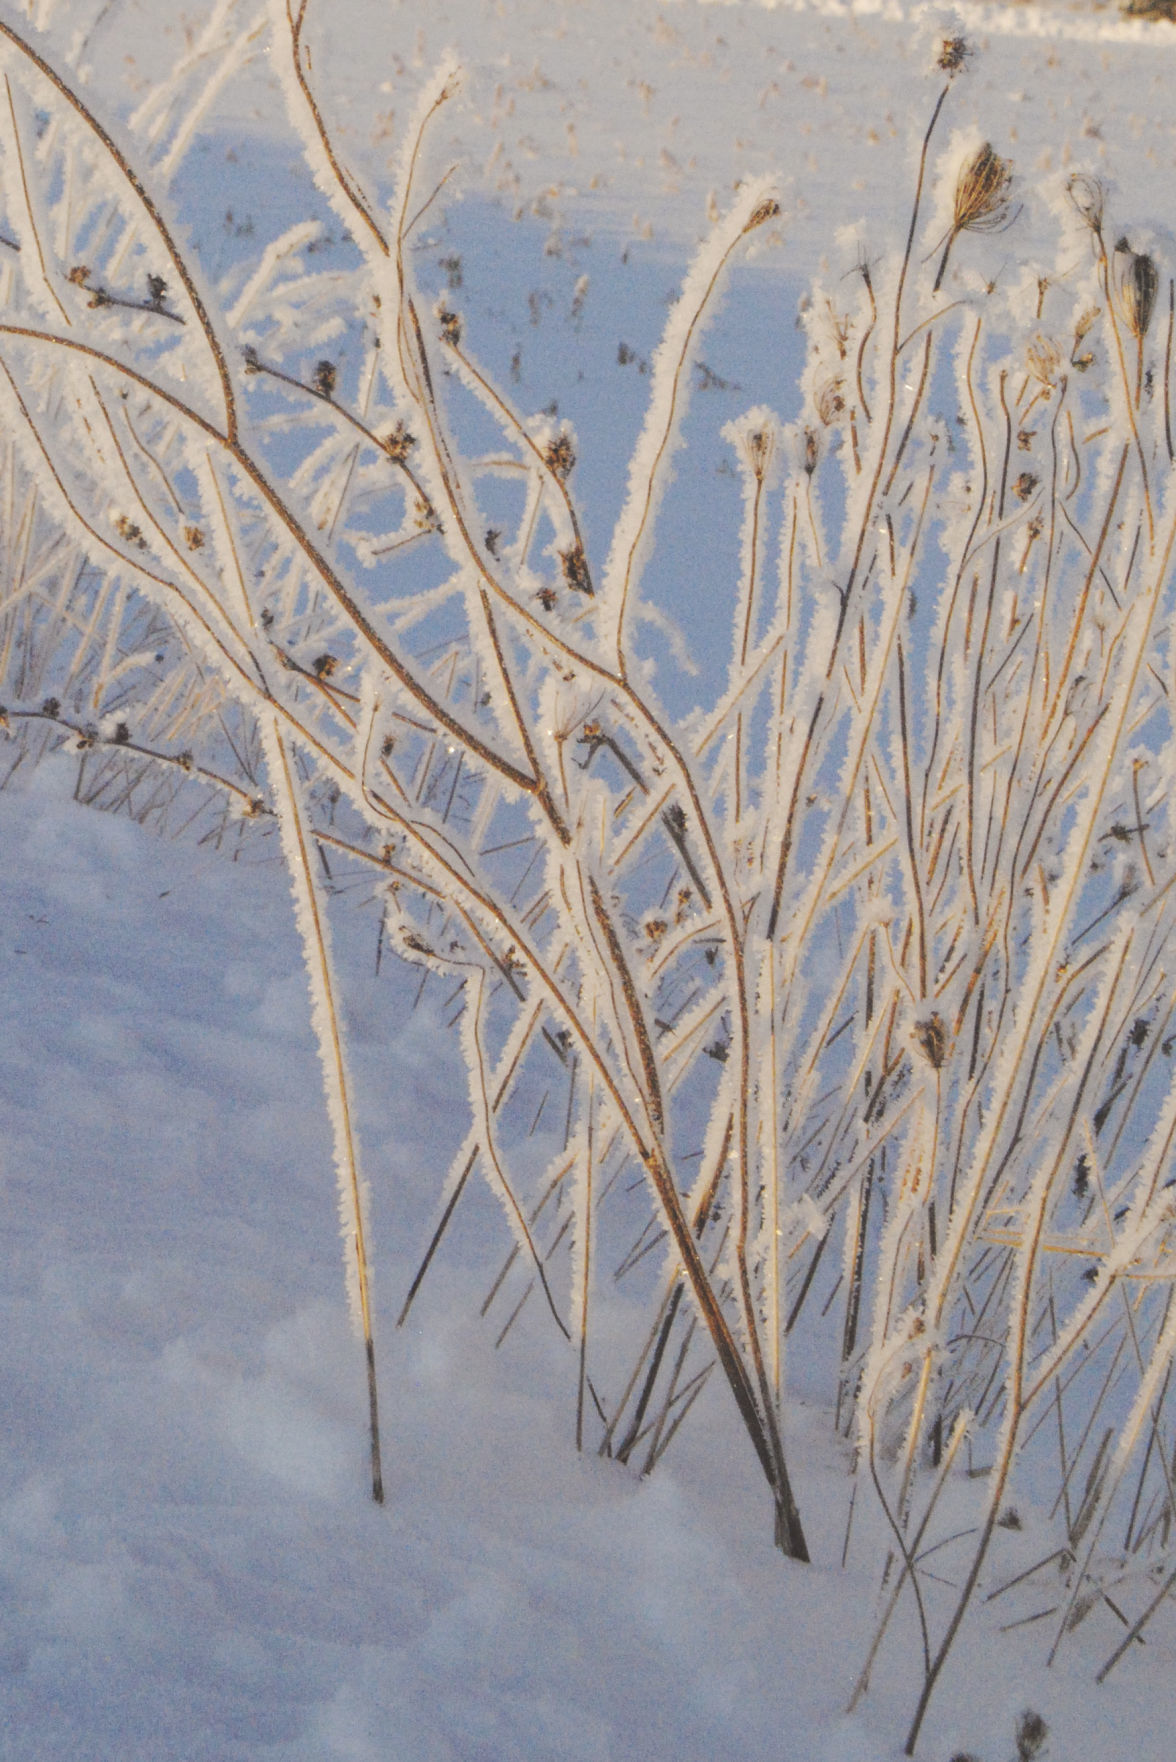 Sunday snow, Monday frost